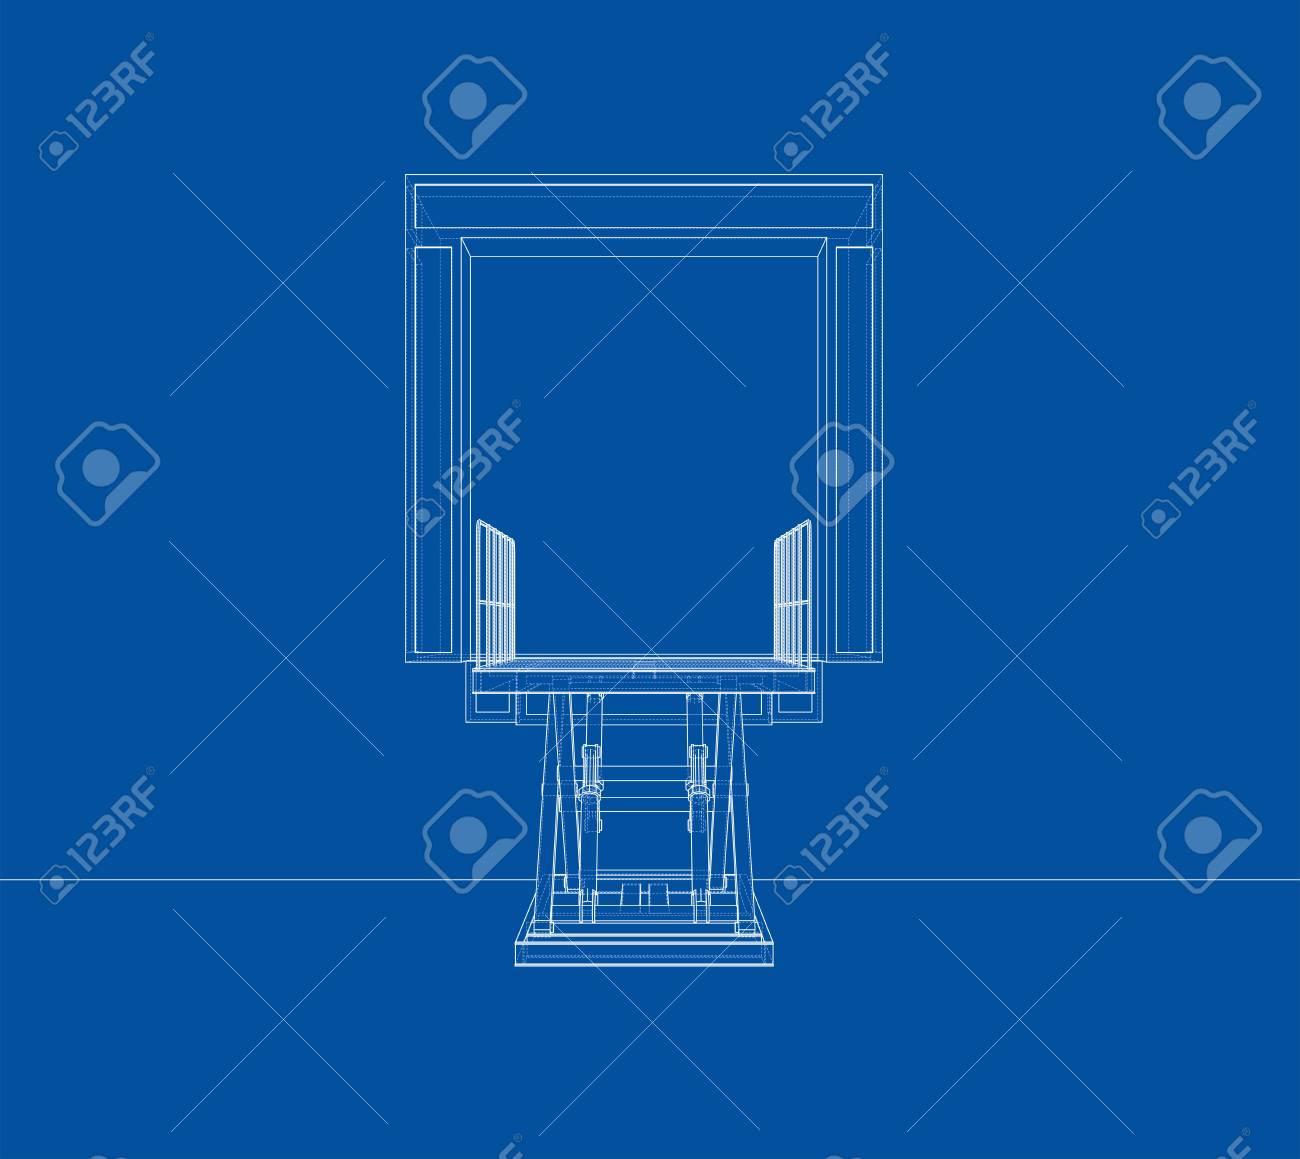 dock leveler concept stock photo - 112920297